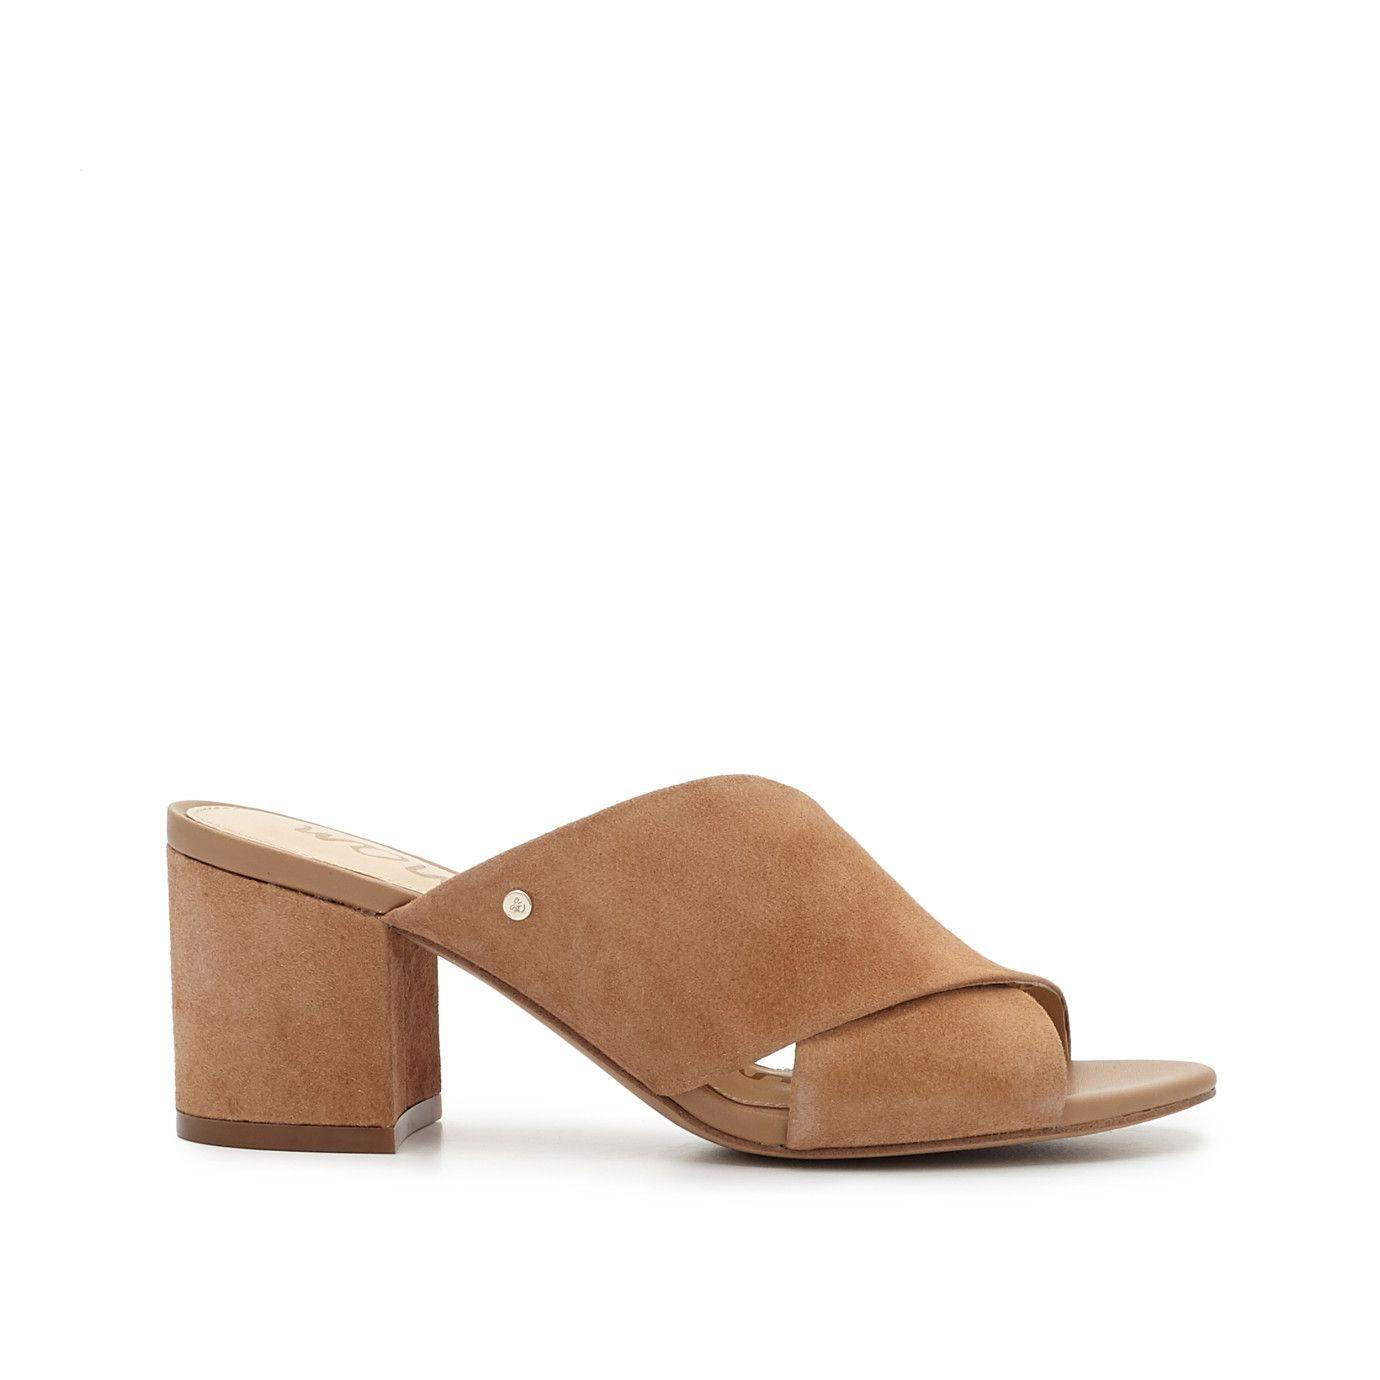 a05e86cb4b4 Stanley Block Heel Mule Sandal by Sam Edelman - Golden Caramel Suede - View  2